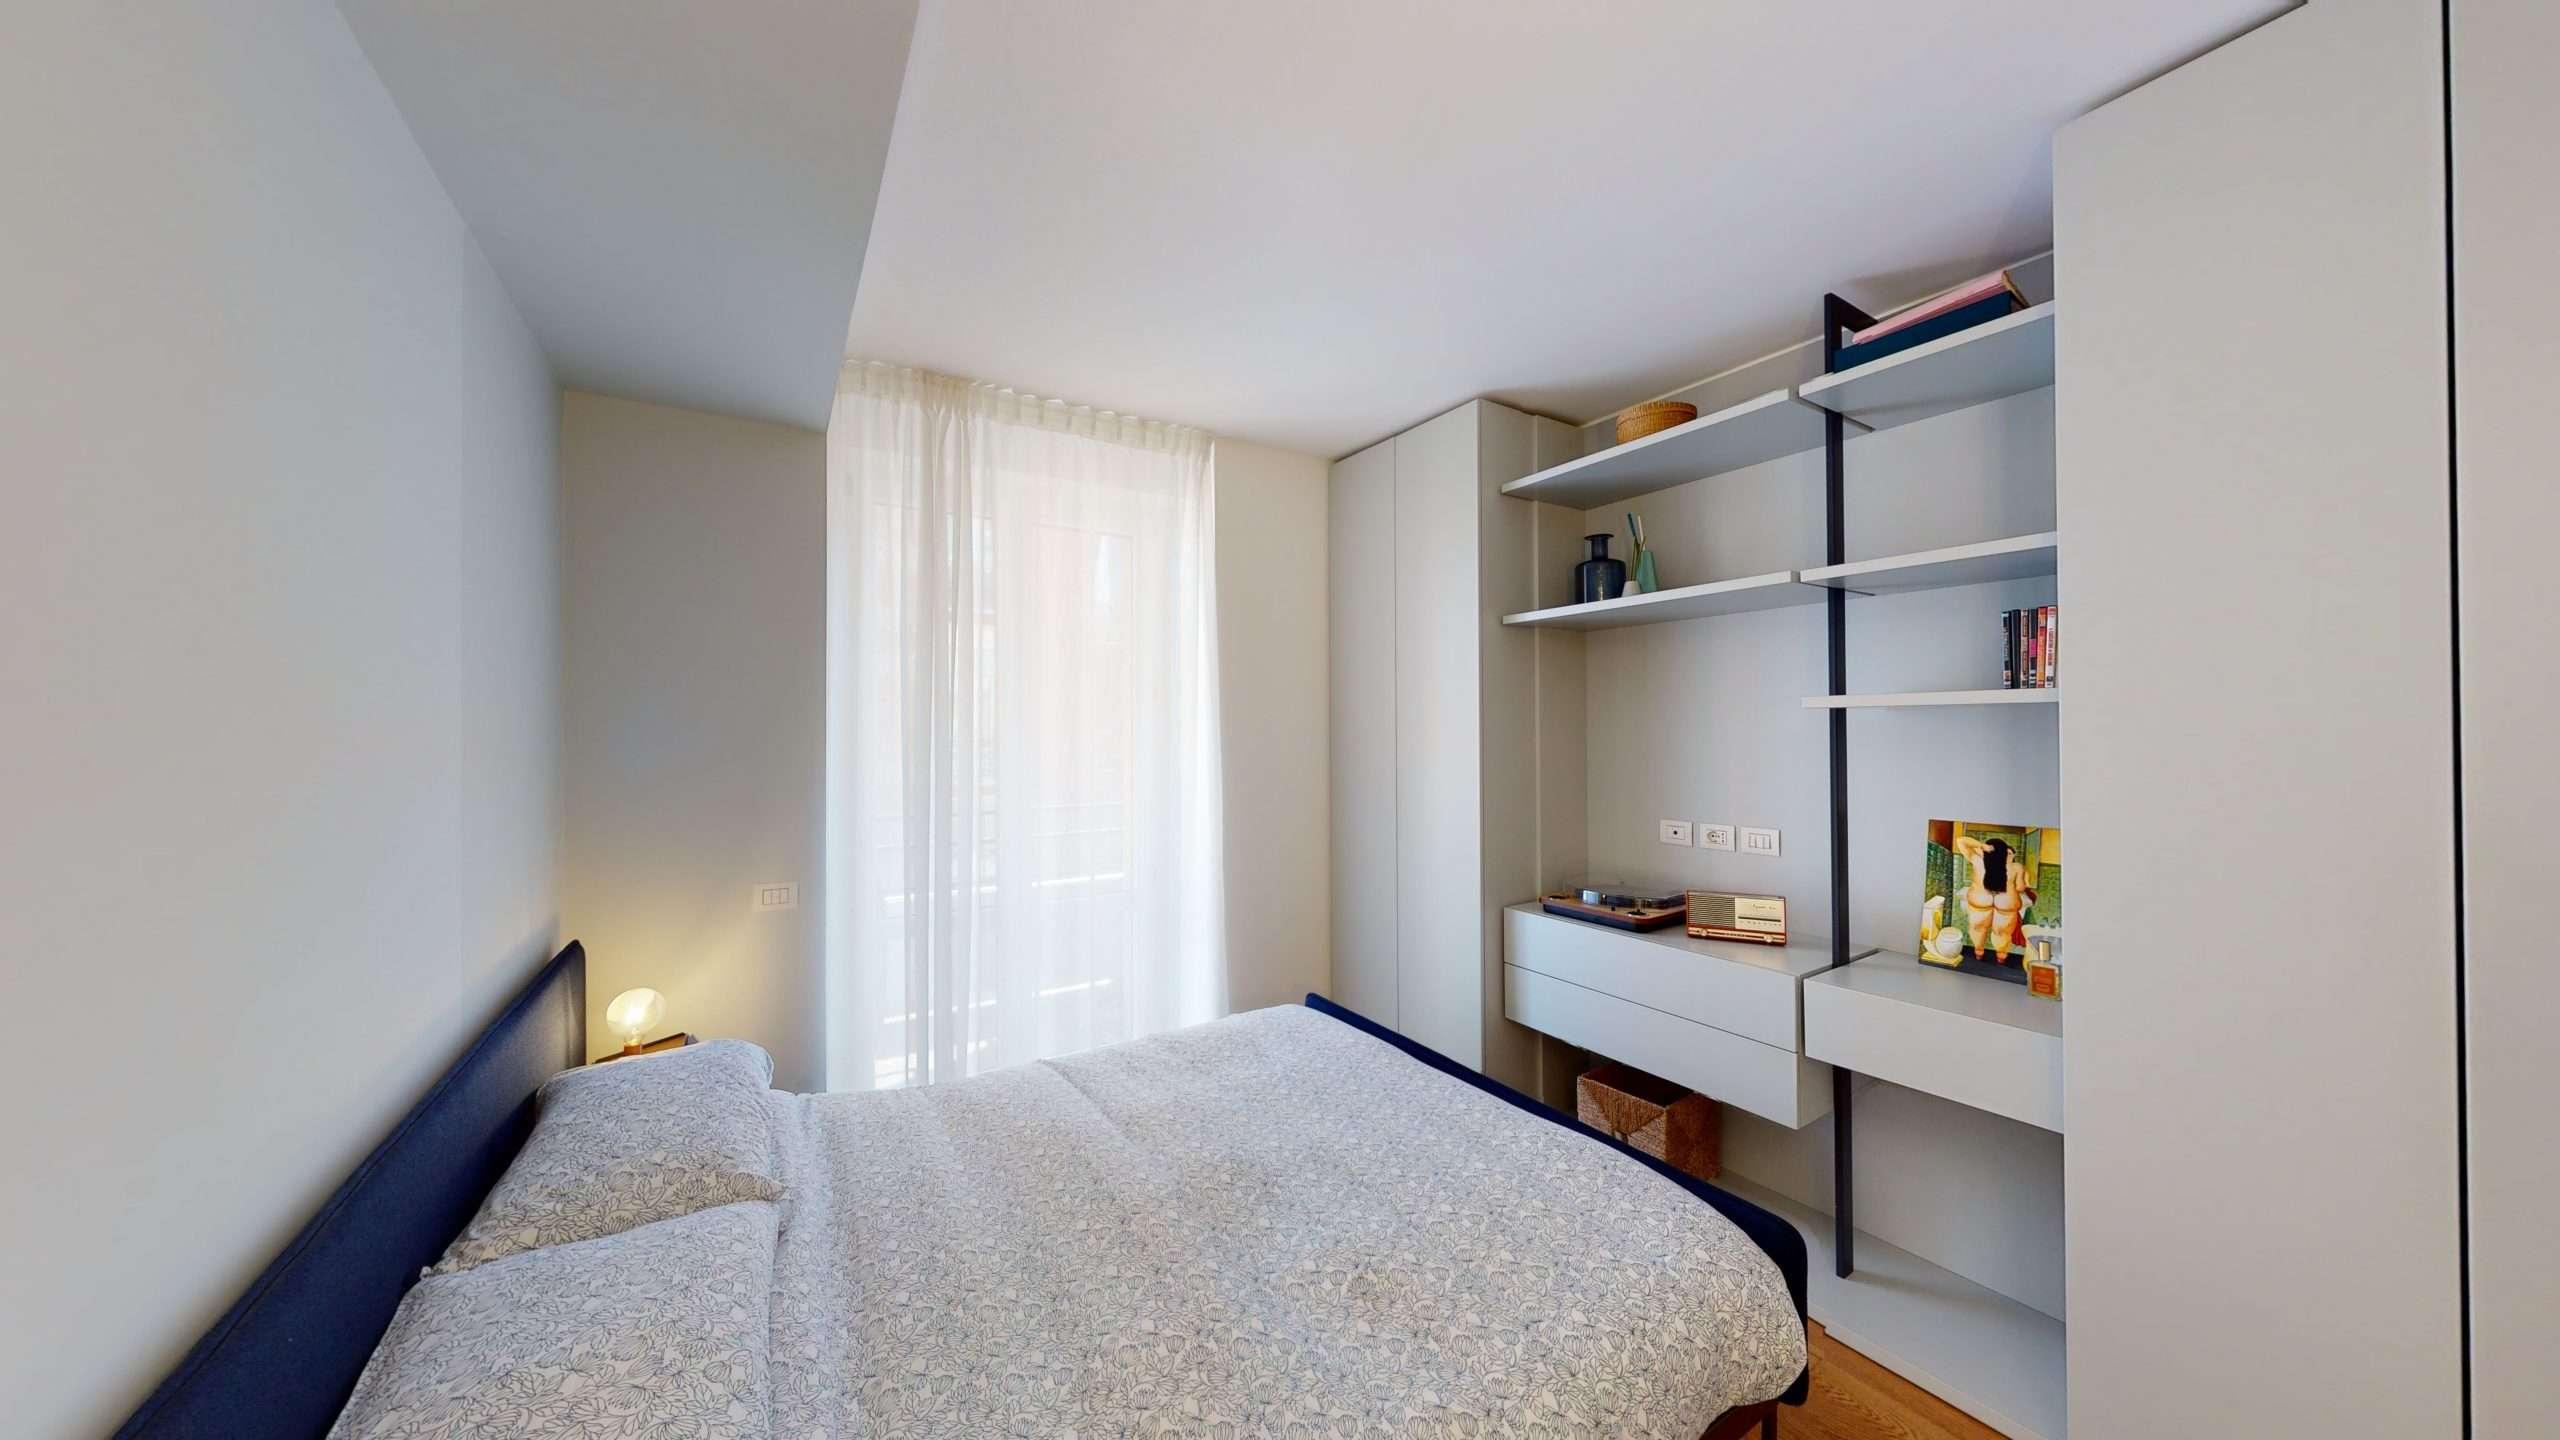 Via-Viotti-13-Milano-bedroom(2c)